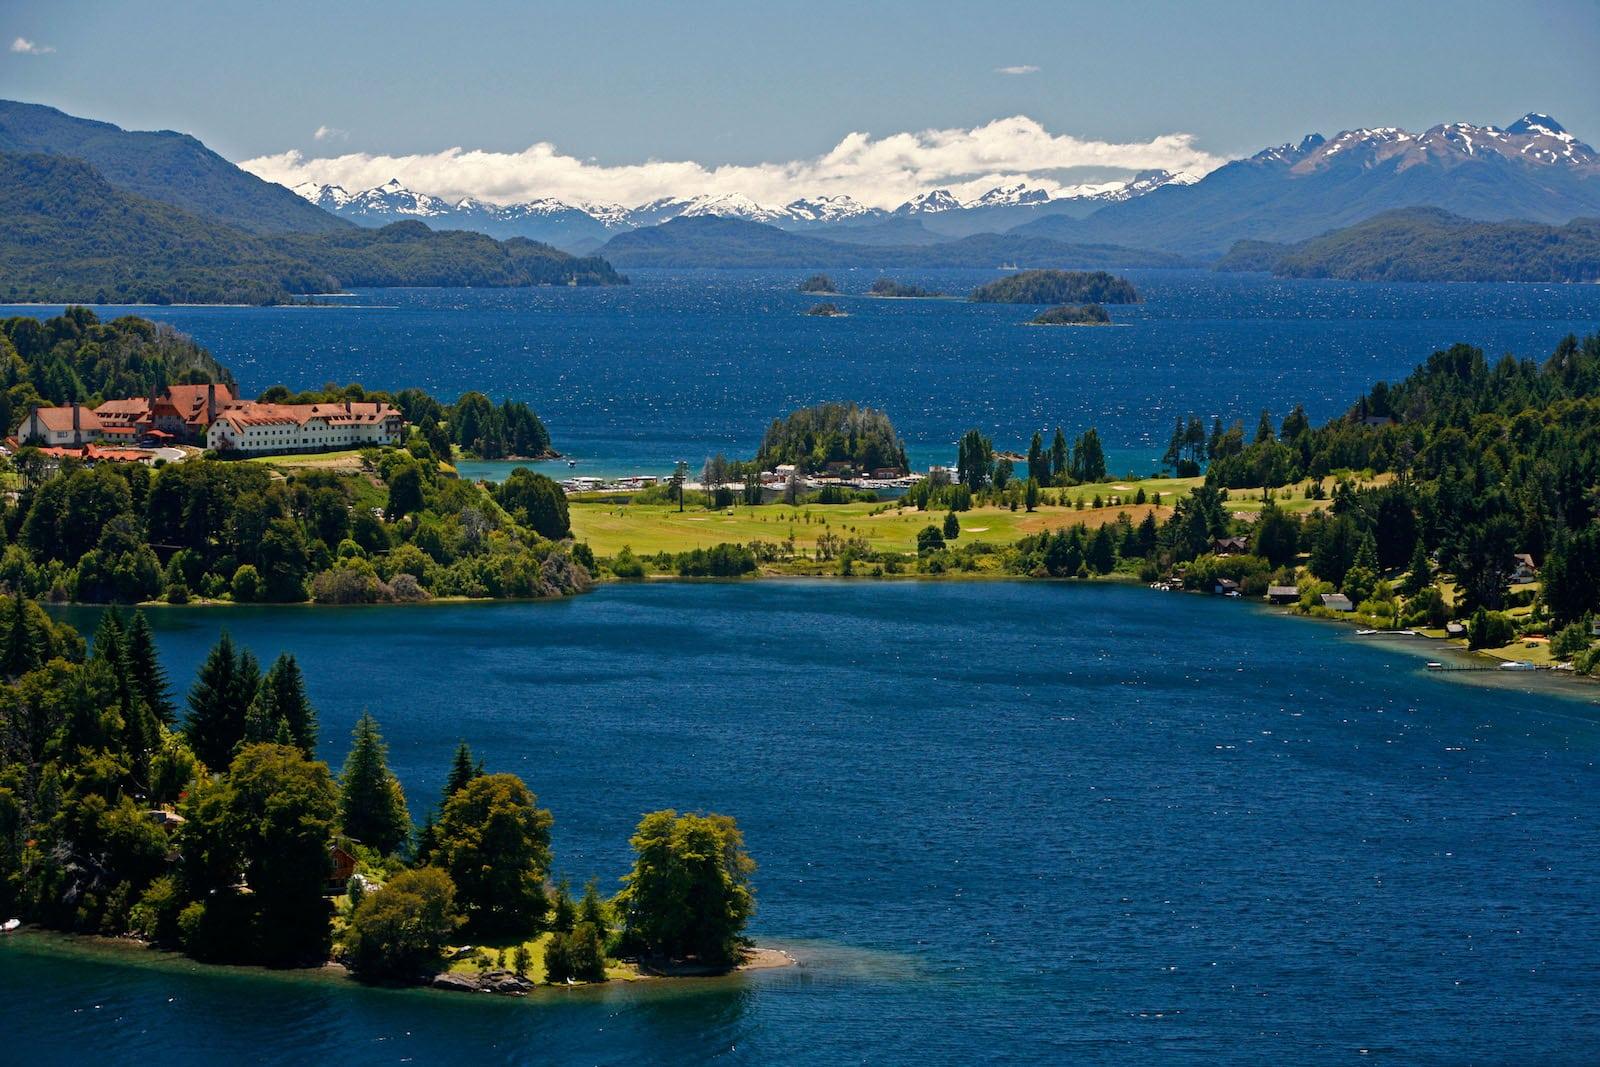 Bariloche, Argentina. 200 kms